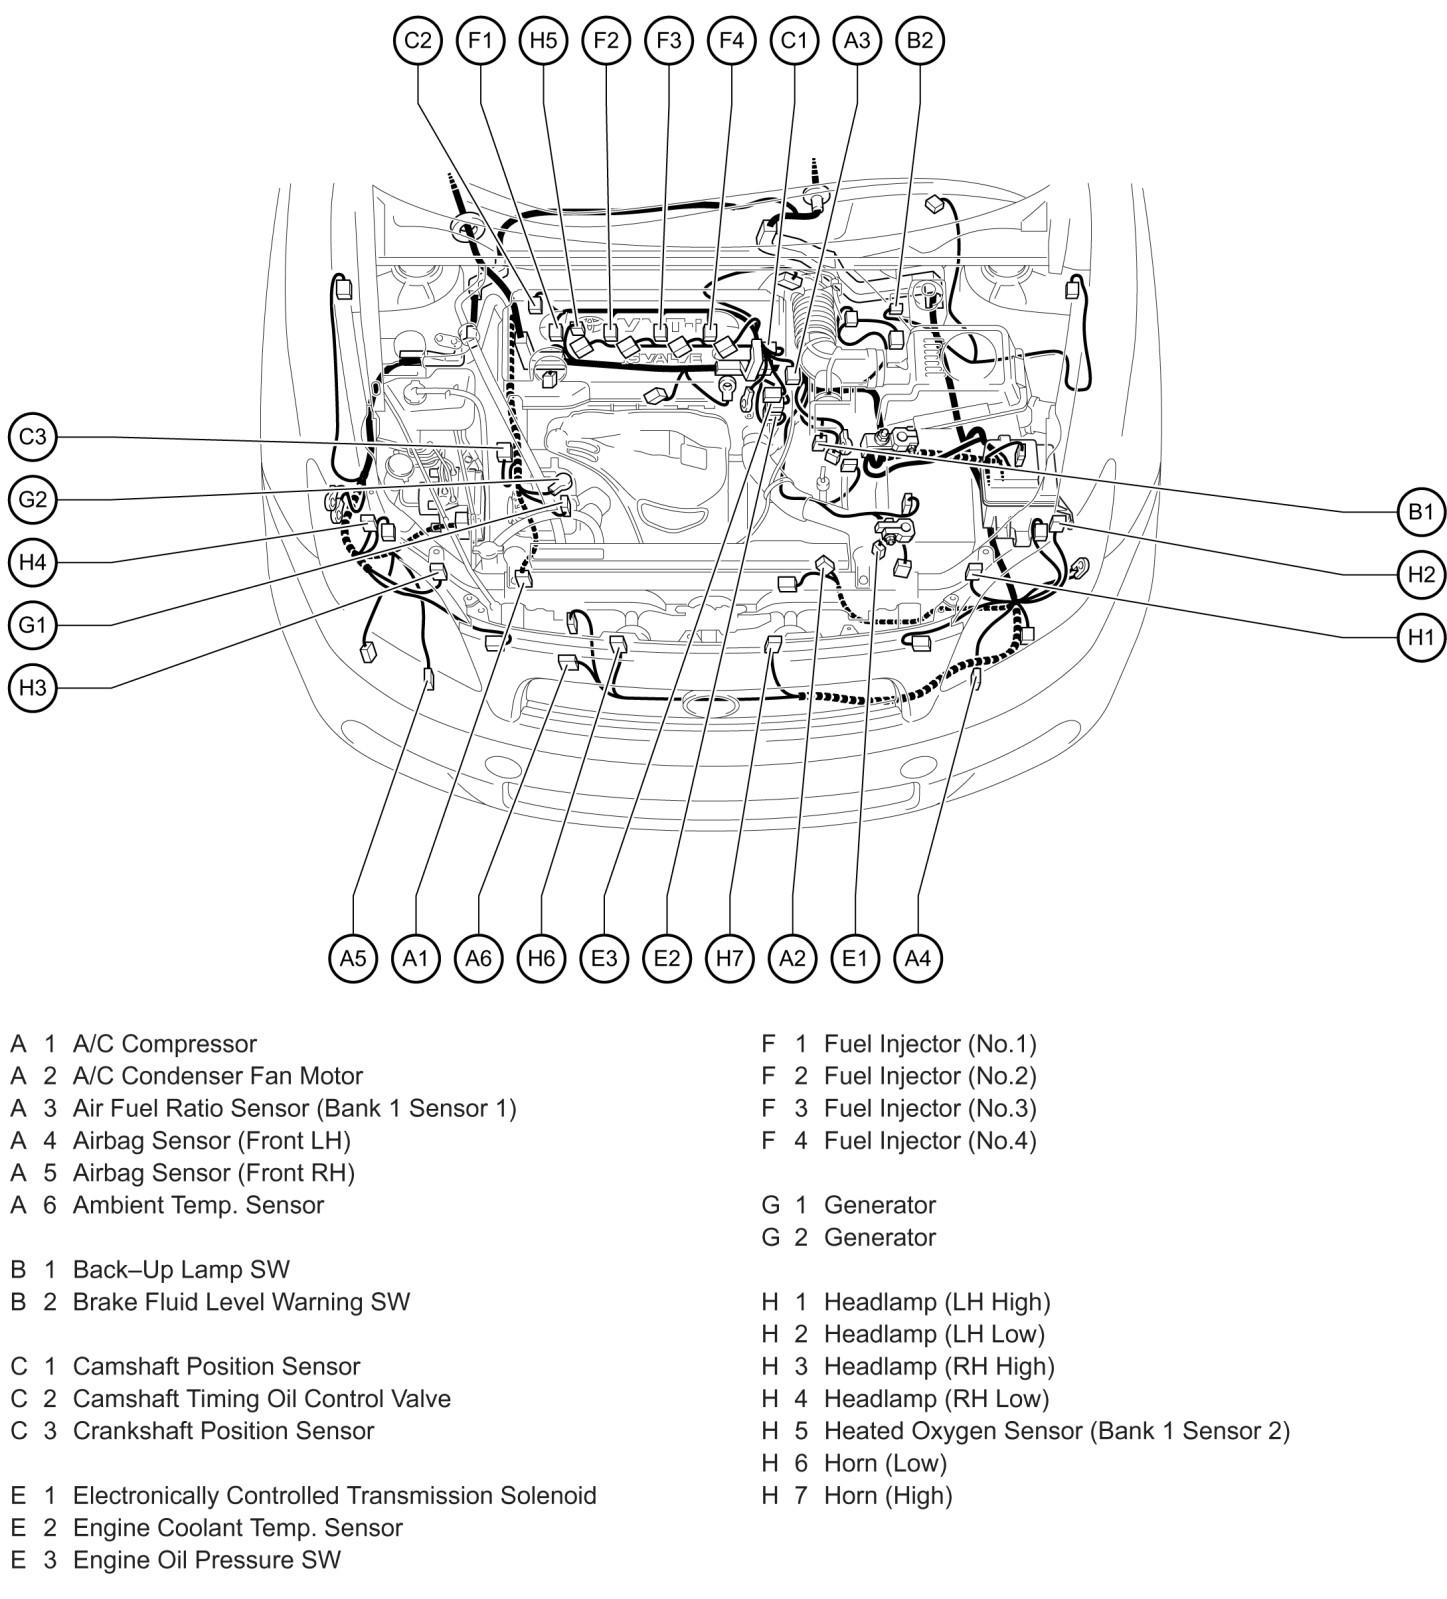 Scion xb engine diagram introduction to electrical wiring diagrams u2022 rh wiringdiagramdesign today